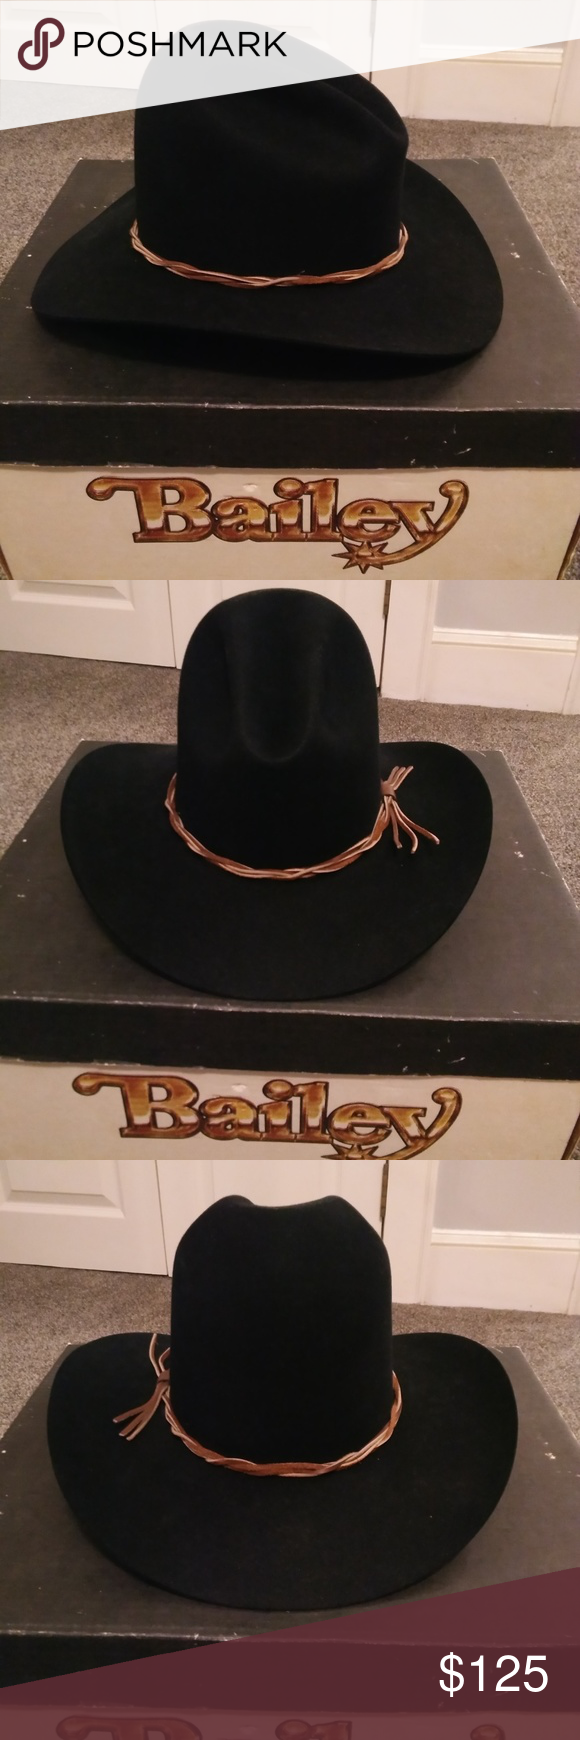 Rodeo King Beaver Quality 5xxxxx Cowboy Hat Cowboy Hats Quality Hats Cowboy